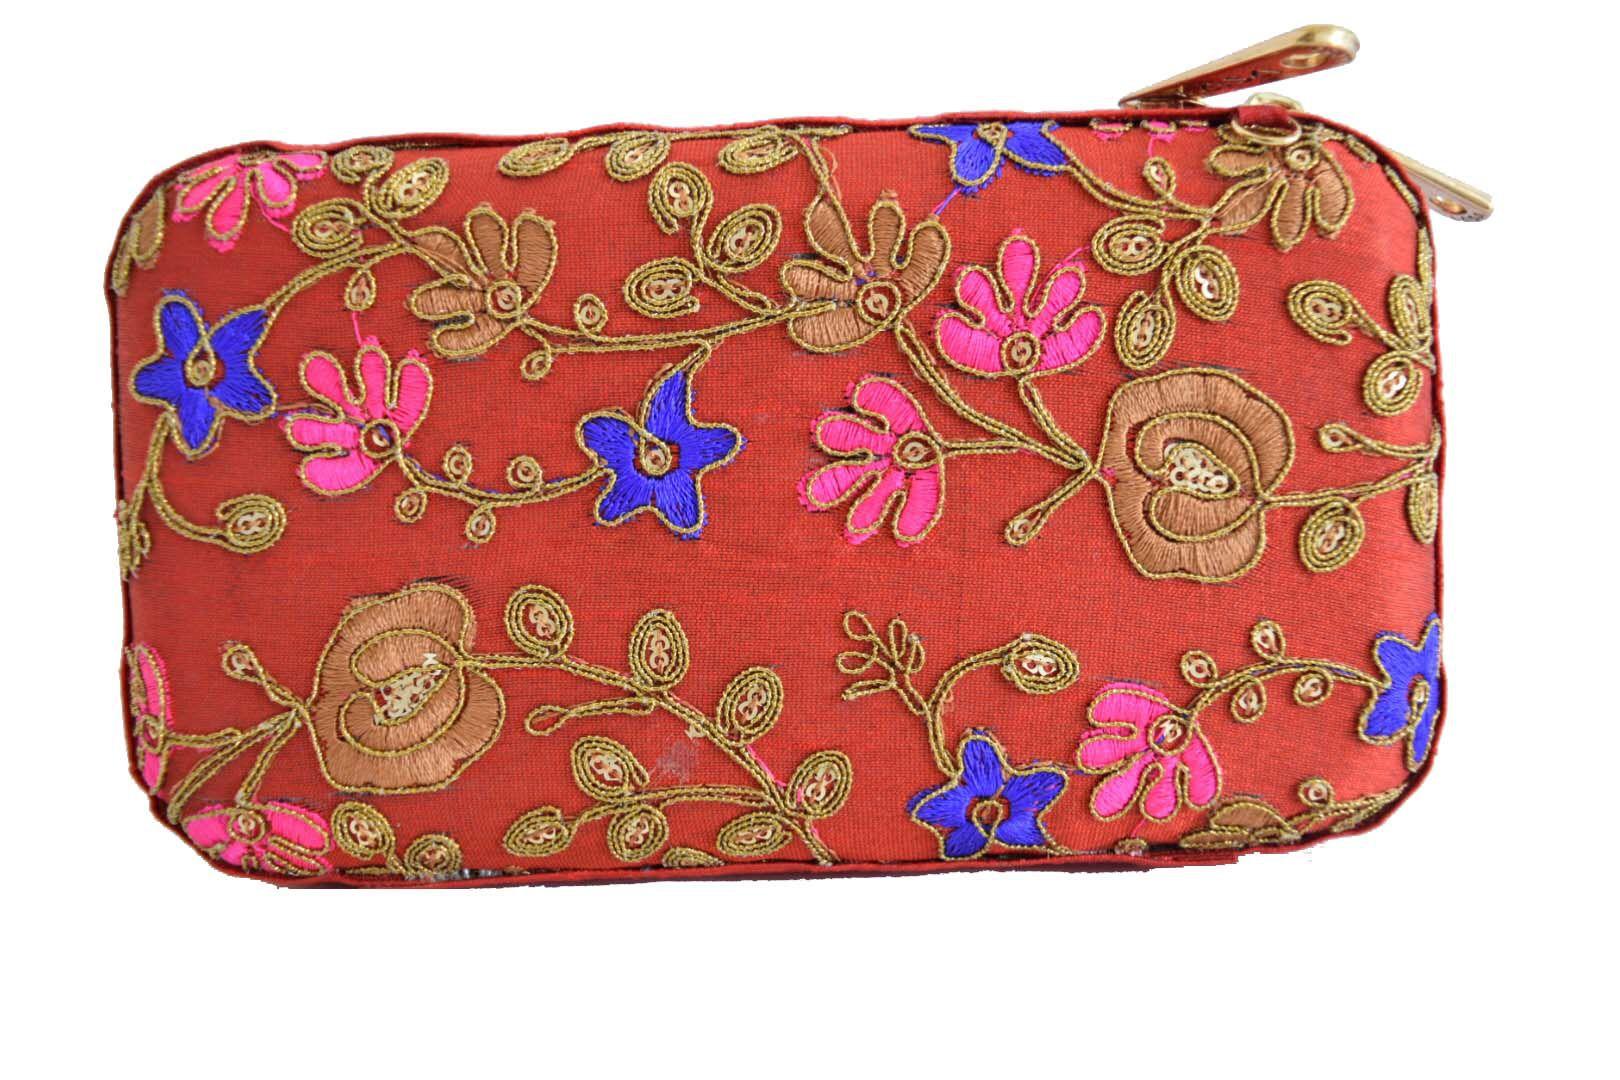 Mahadev Exports Multi Fabric Box Clutch